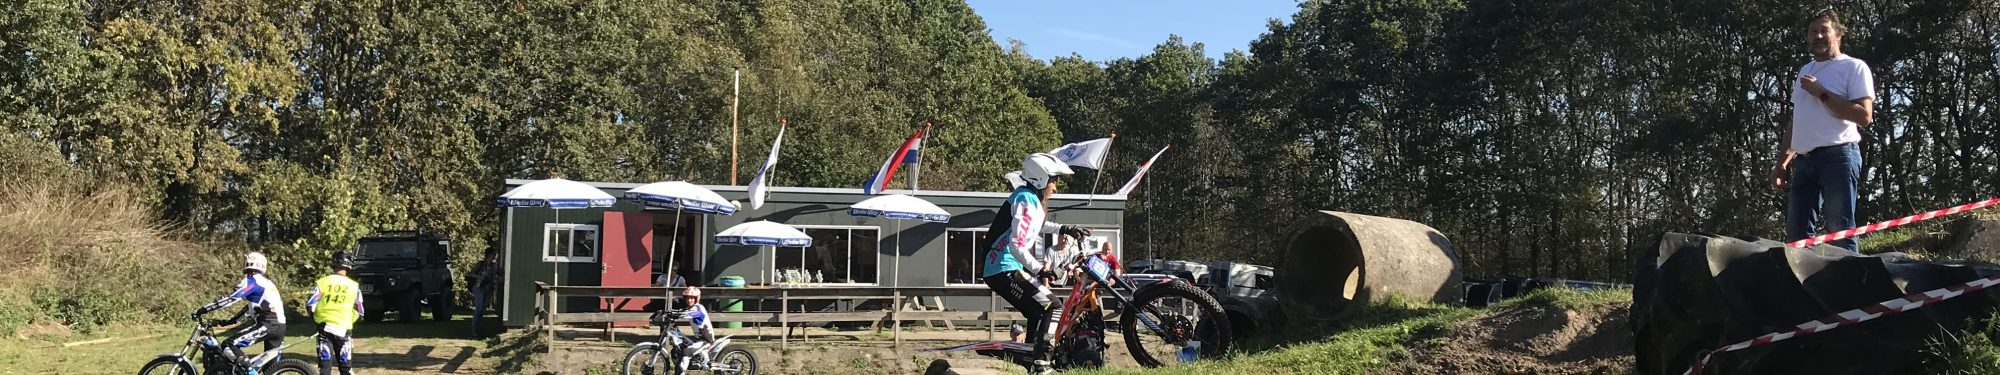 Trialclub Zuid-Oost Drenthe